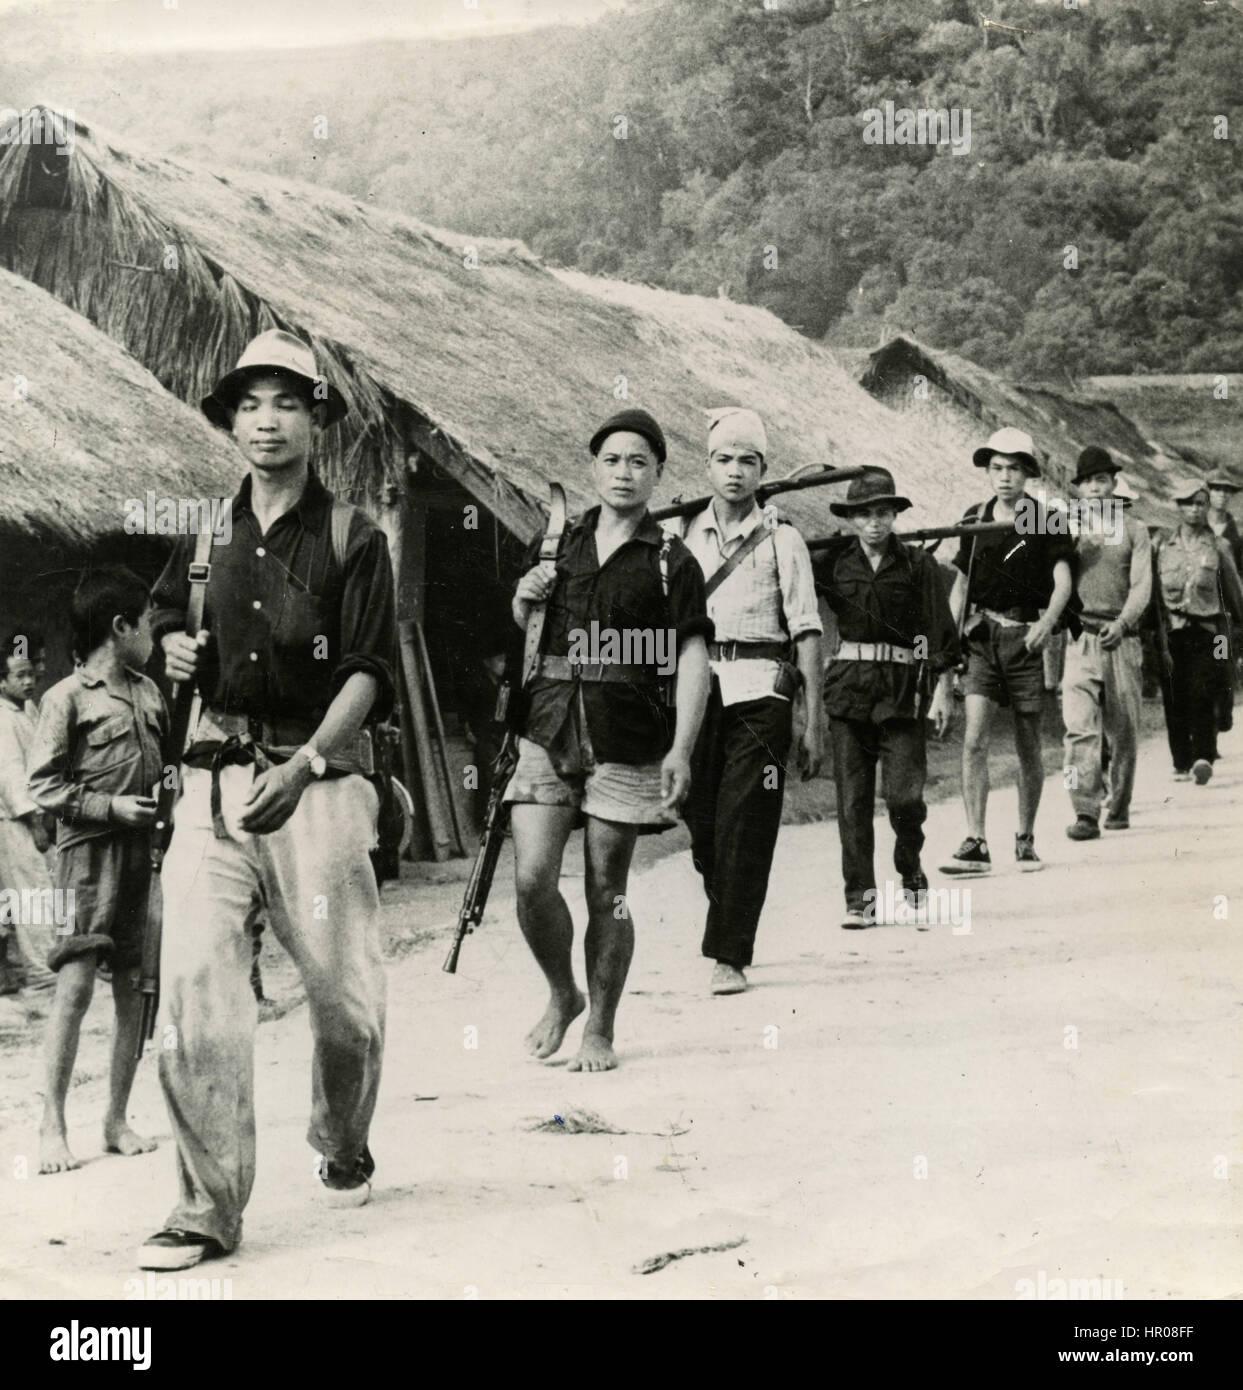 Laotian patrol in a village, Laos - Stock Image